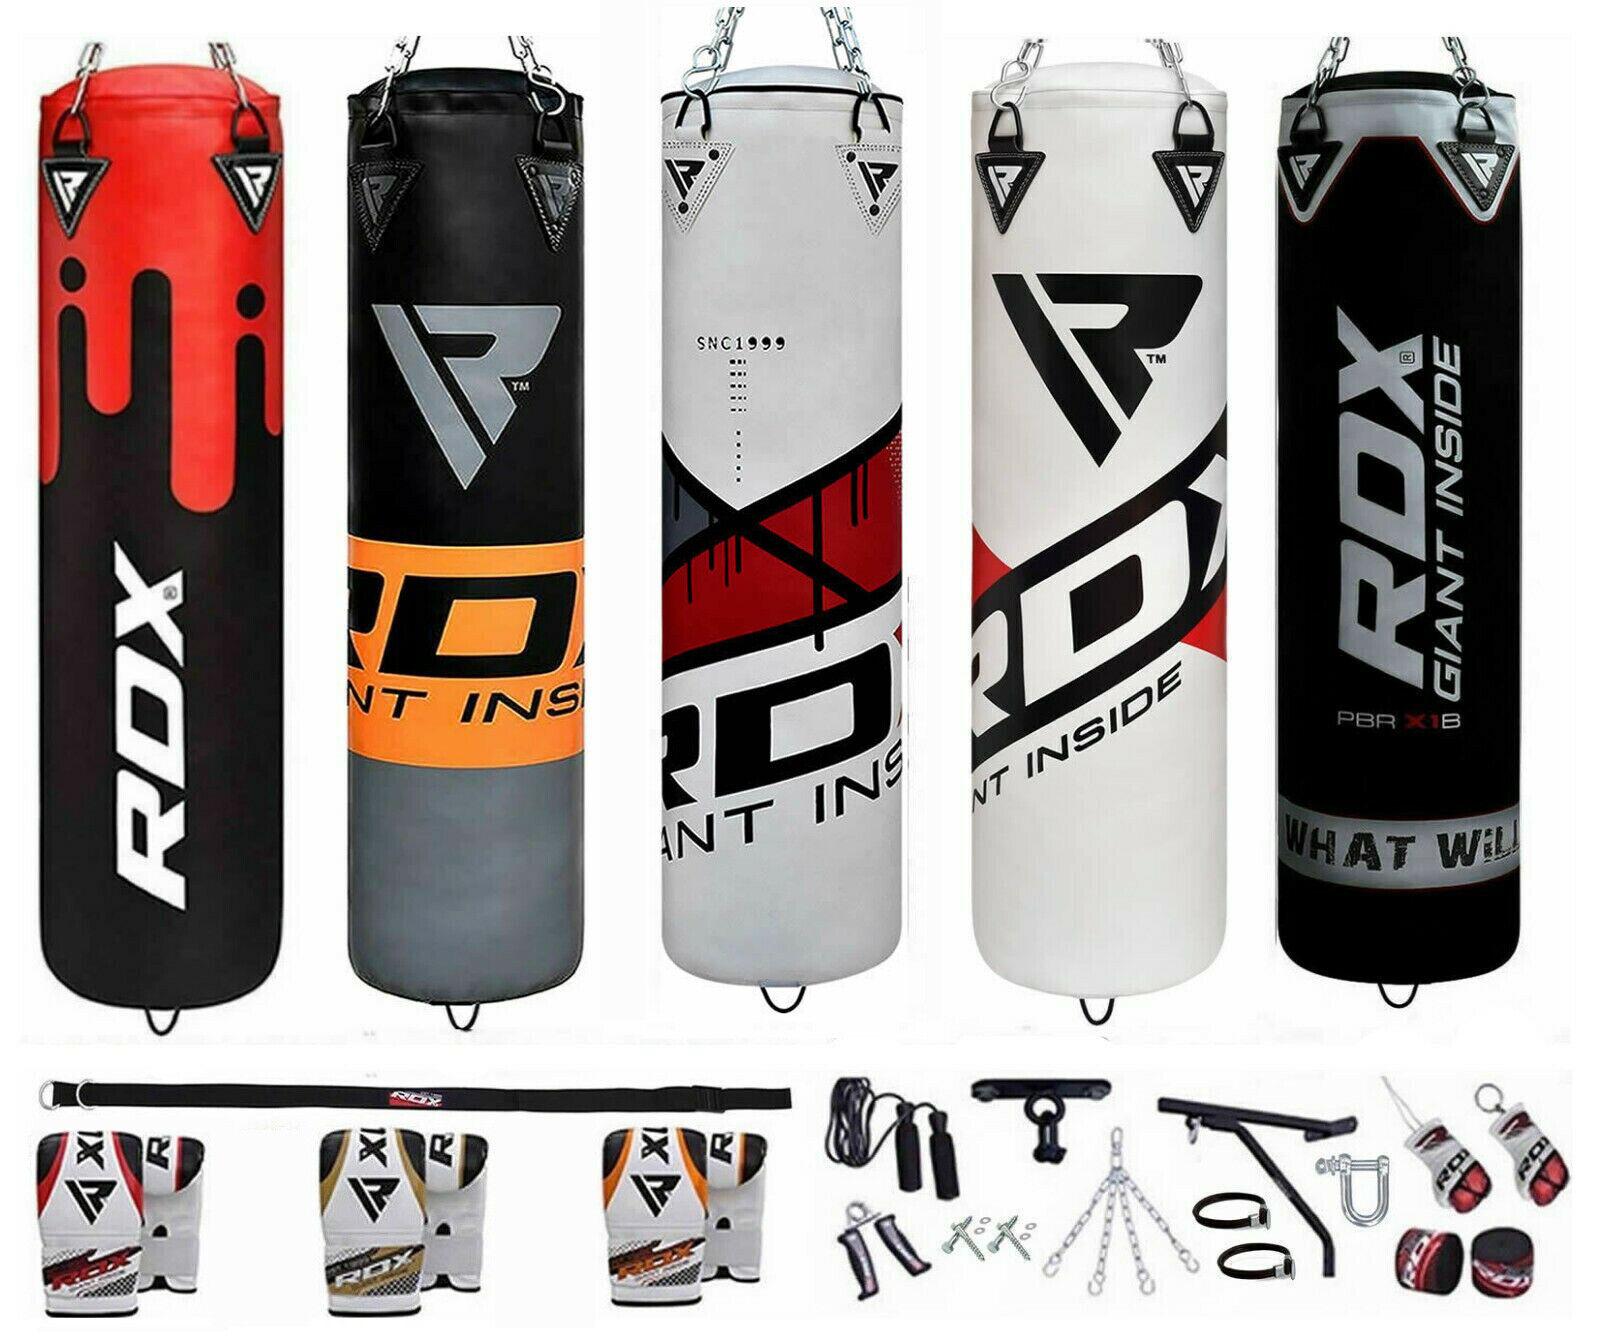 RDX Boxen Boxsack Set Sandsack MMA Gefüllt Boxhandschuhe Halterung Stahlkette DE